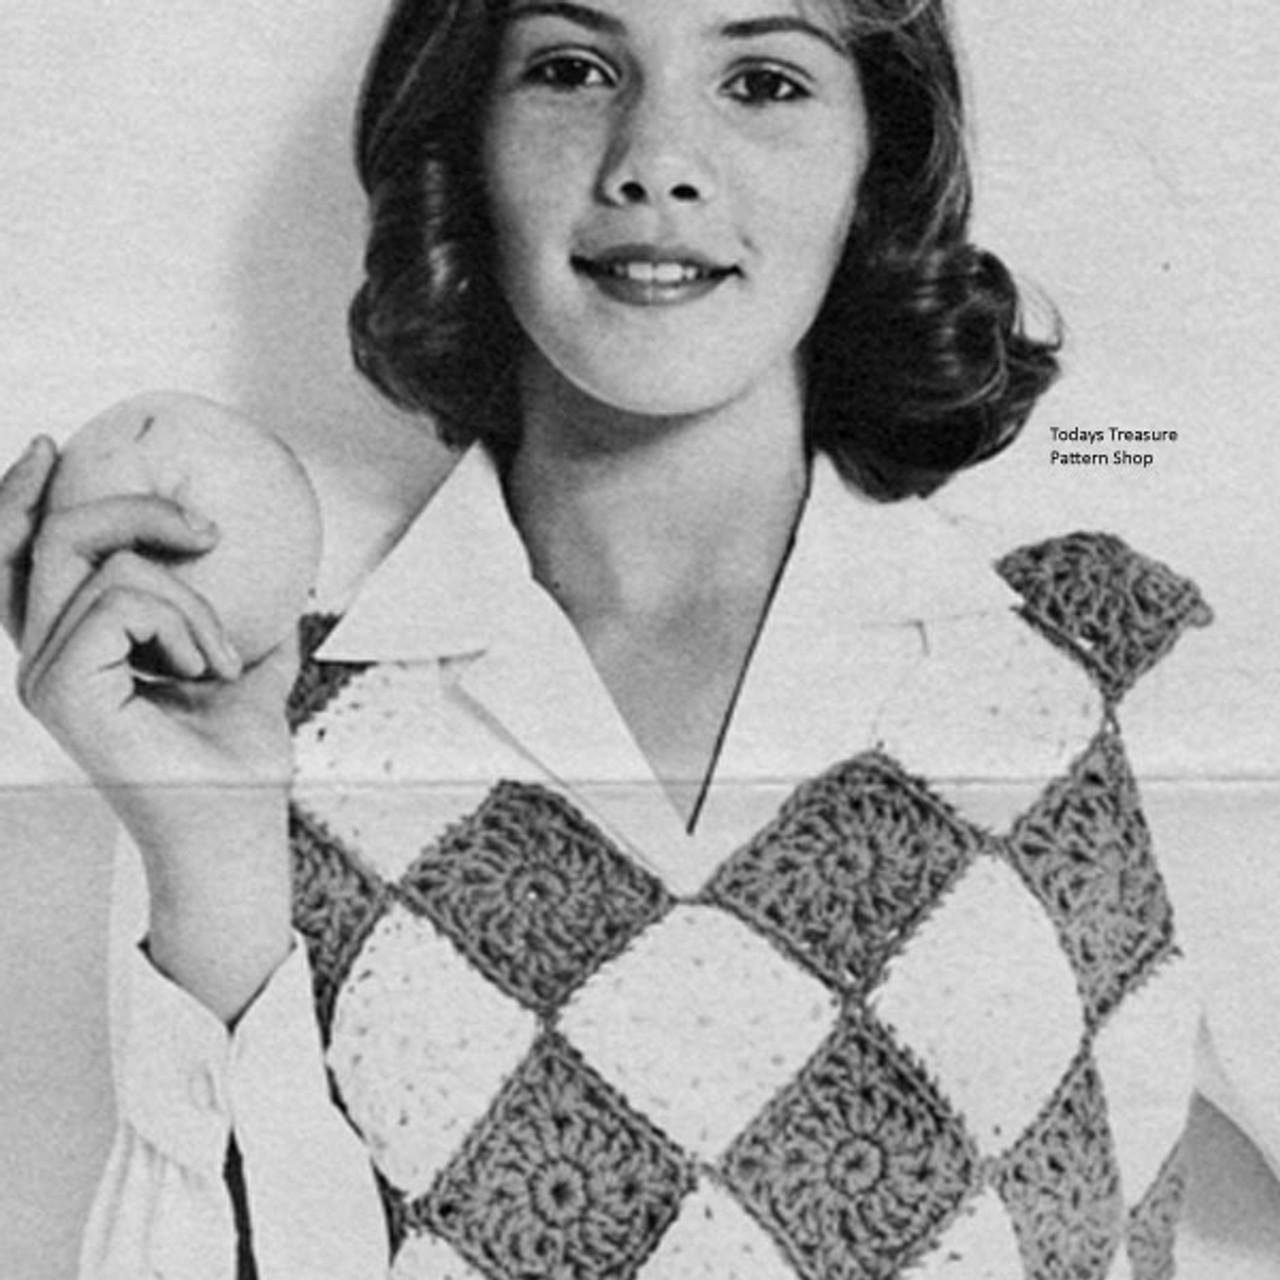 Vintage Crochet Sleeeveless Top Pattern in Diamonds